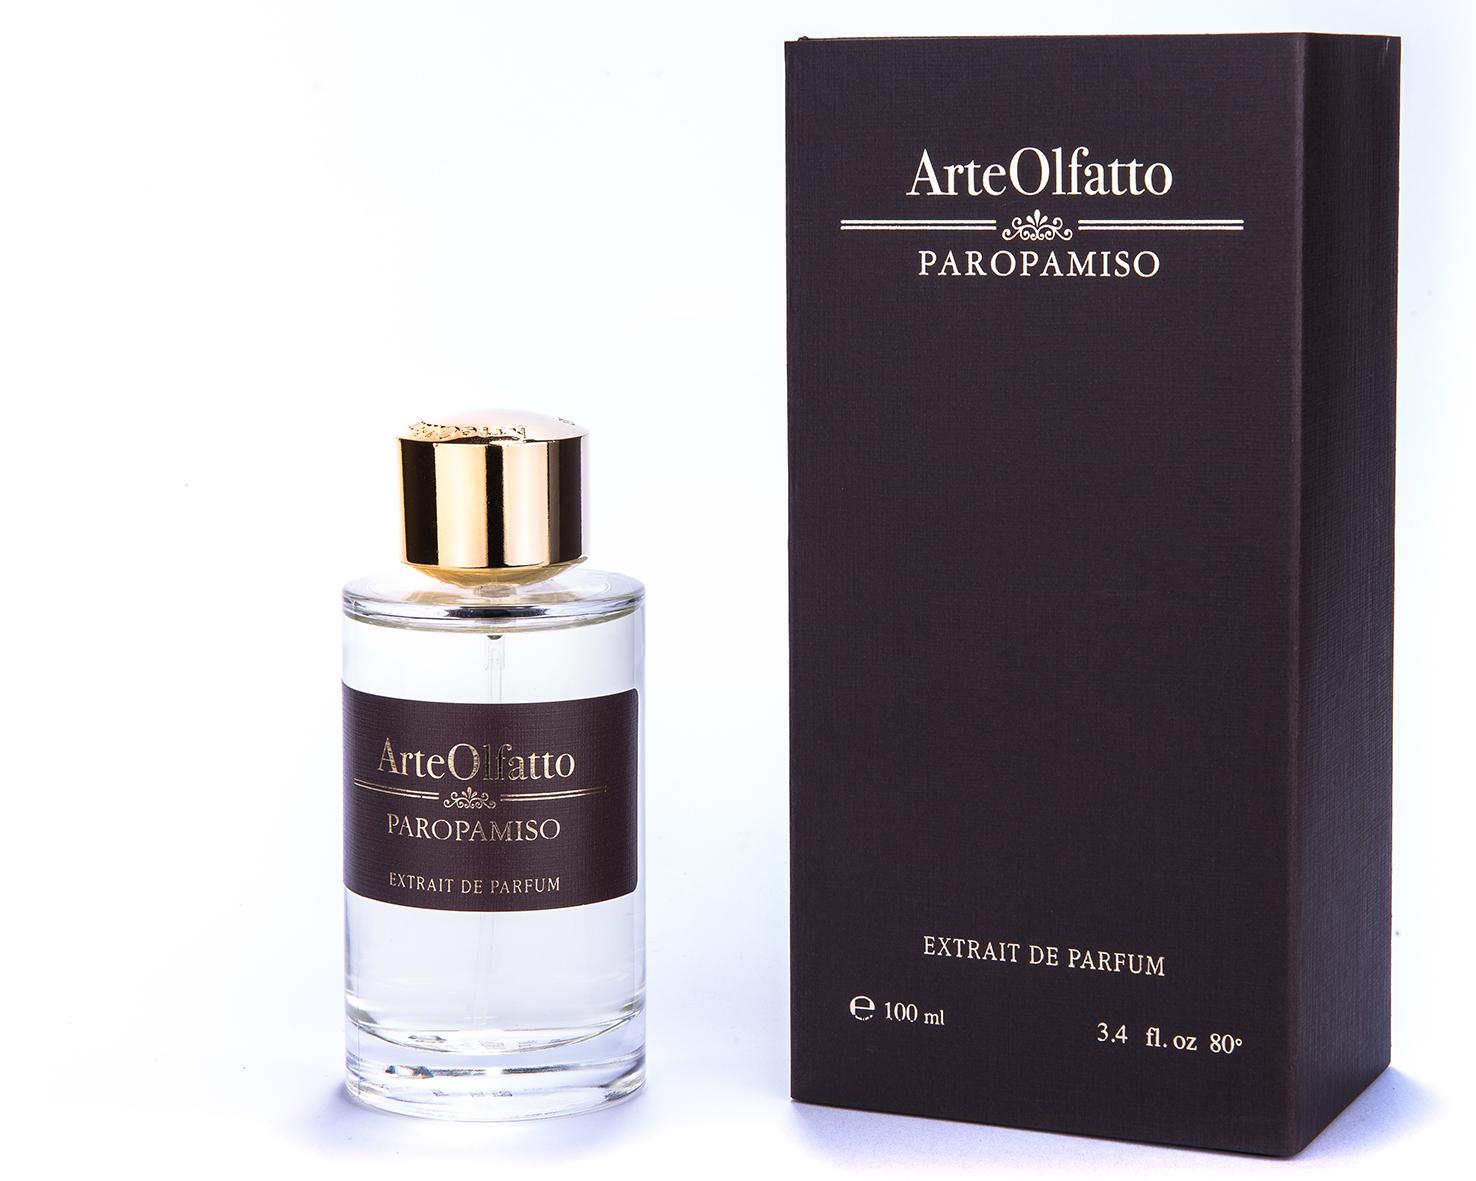 ArteOlfatto - Luxury Perfumes Paropamiso EXTRAIT Parfum 100 ml